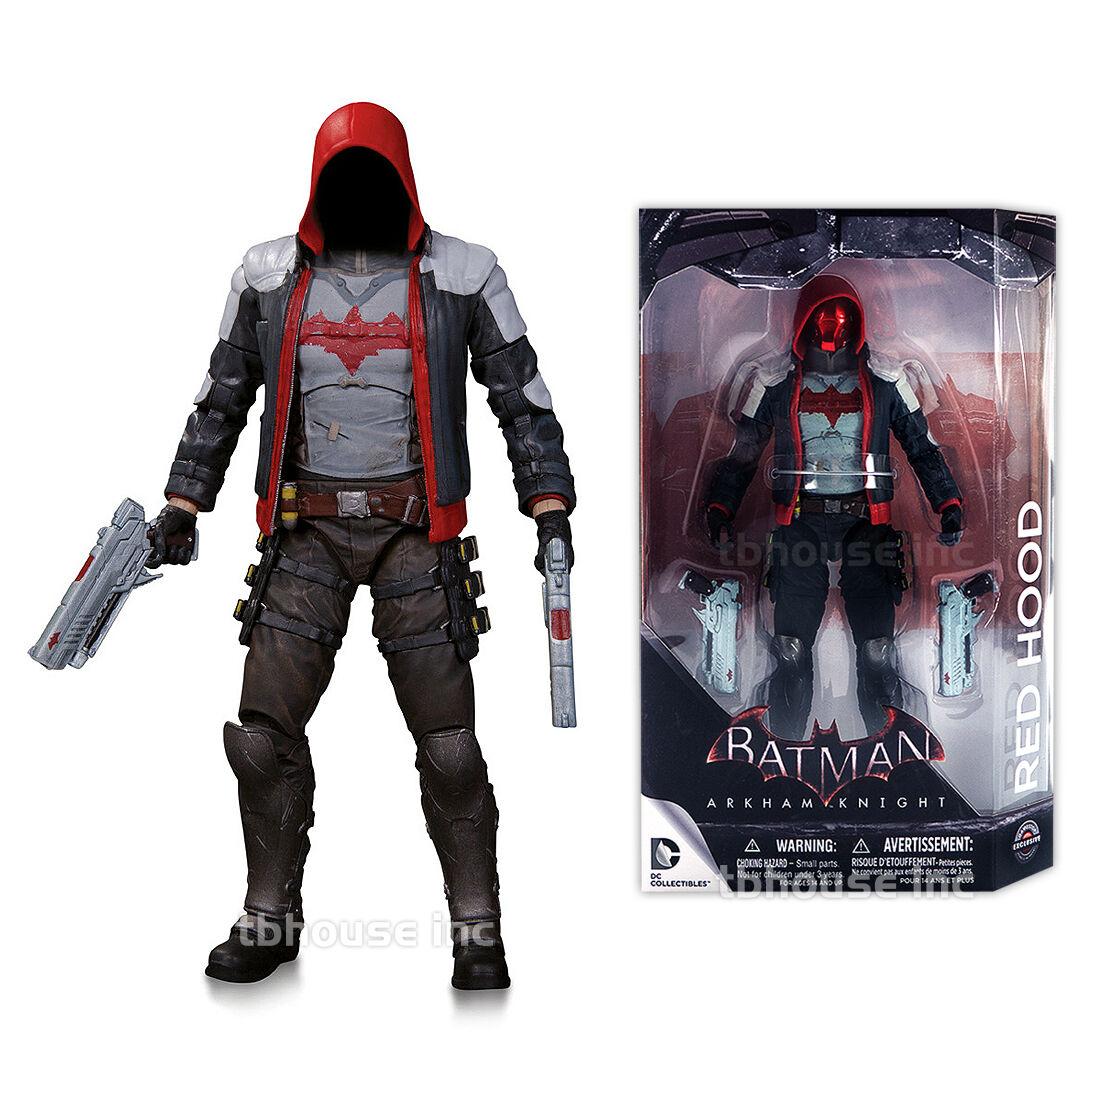 Batman Arkham Knight - Action figure $_57